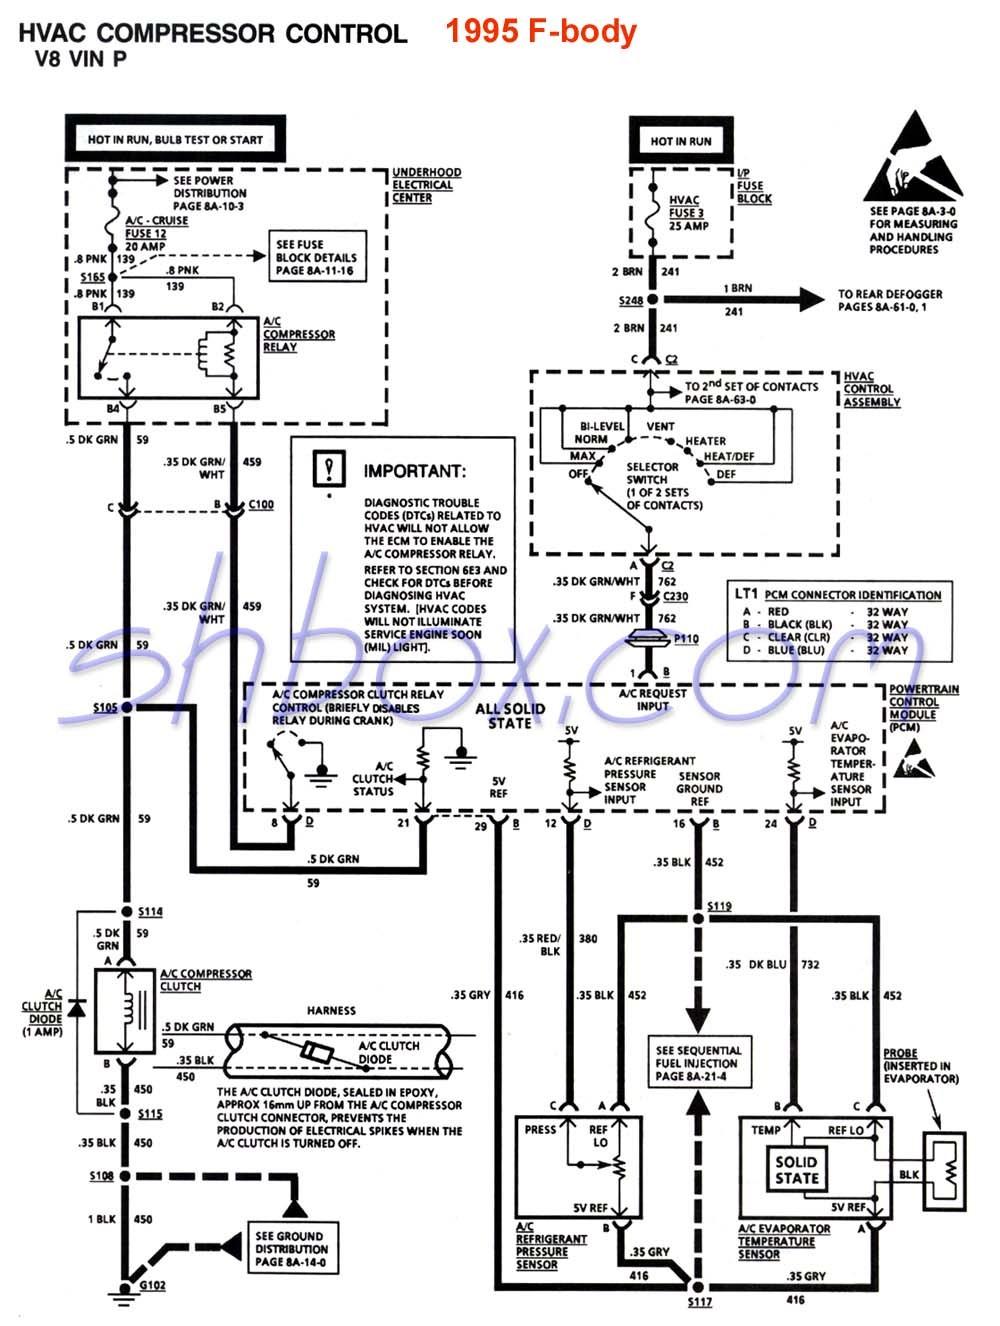 ac compressor wiring diagram Collection-gm hvac diagrams wiring diagram hvac reciprocating pressor diagram 4th gen lt1 f body tech aids 18-d